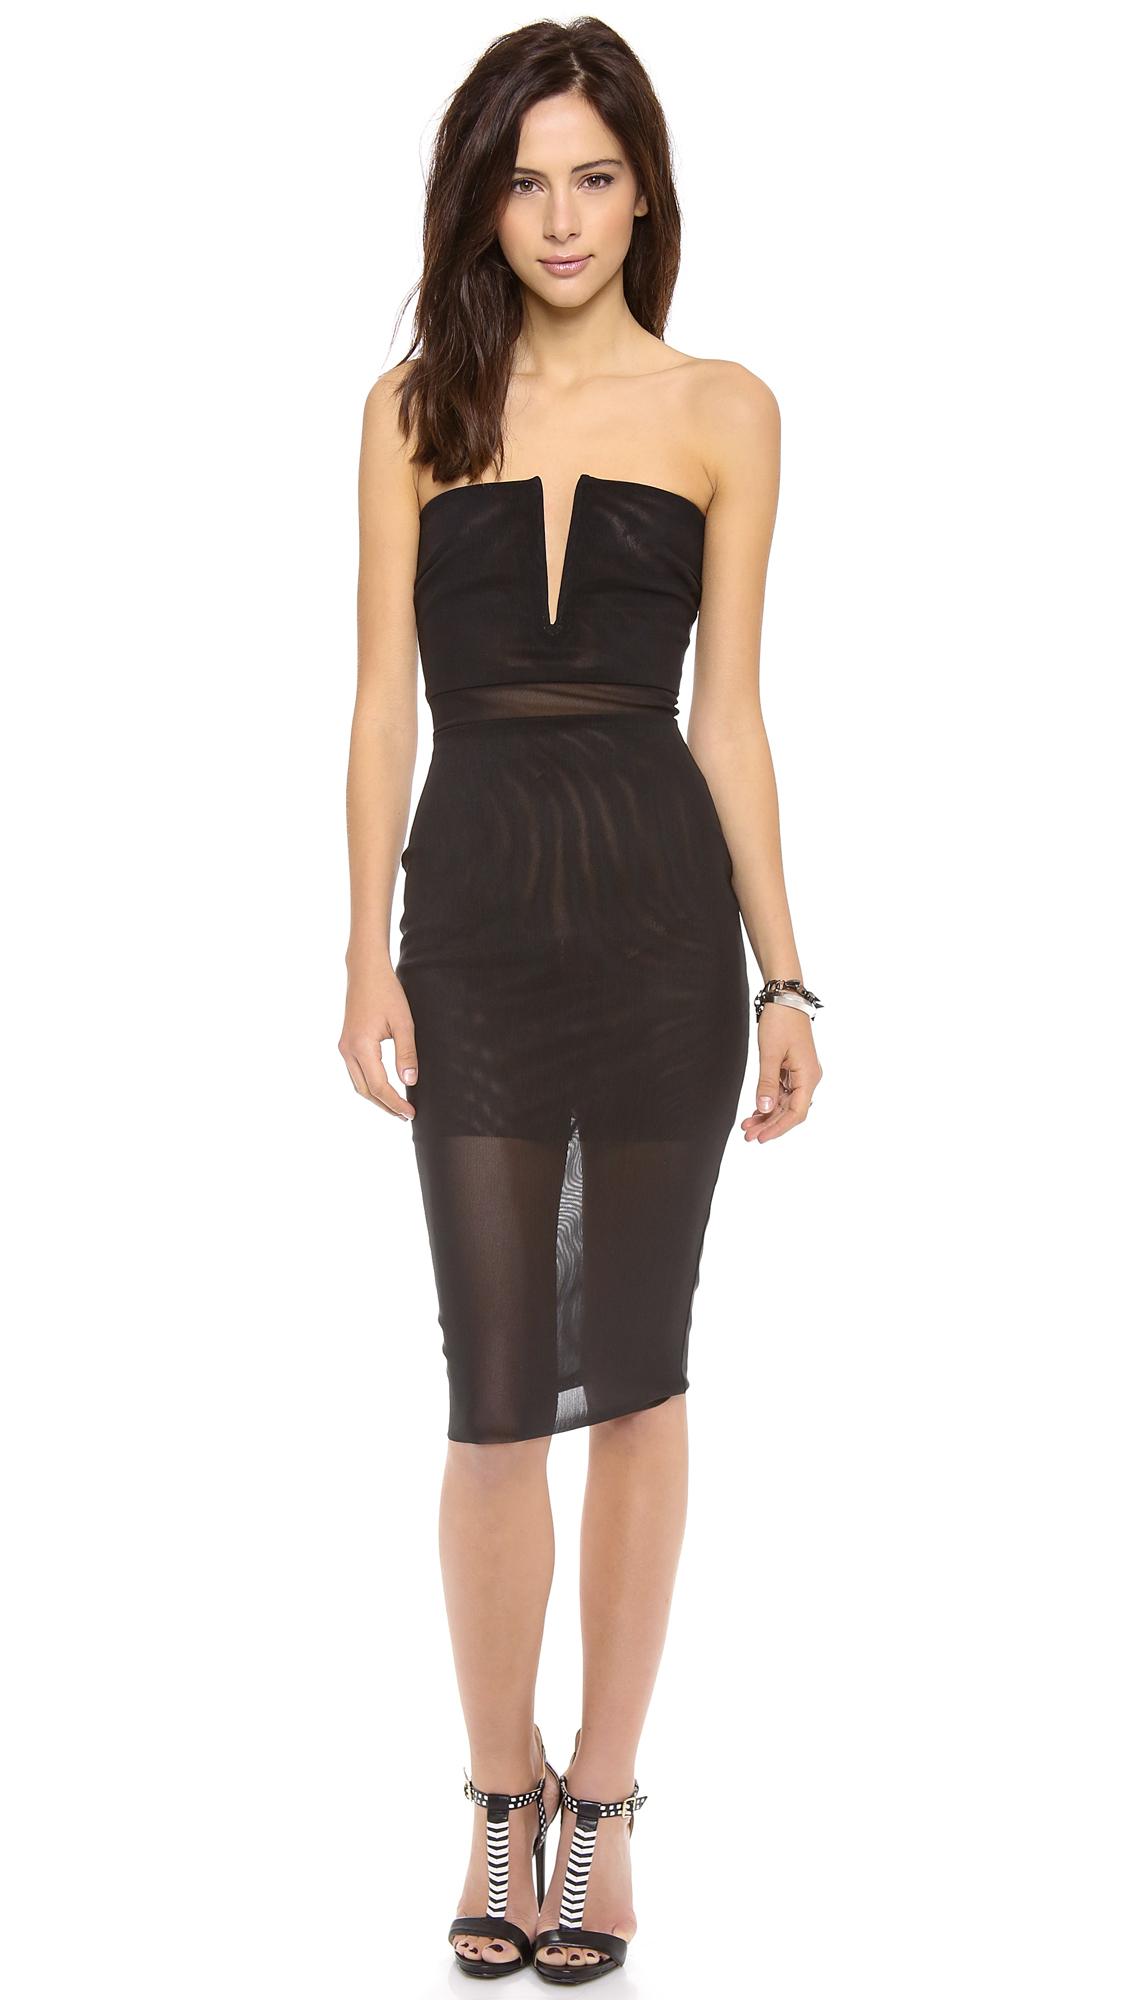 Bec Amp Bridge Kathy Strapless Dress In Black Lyst